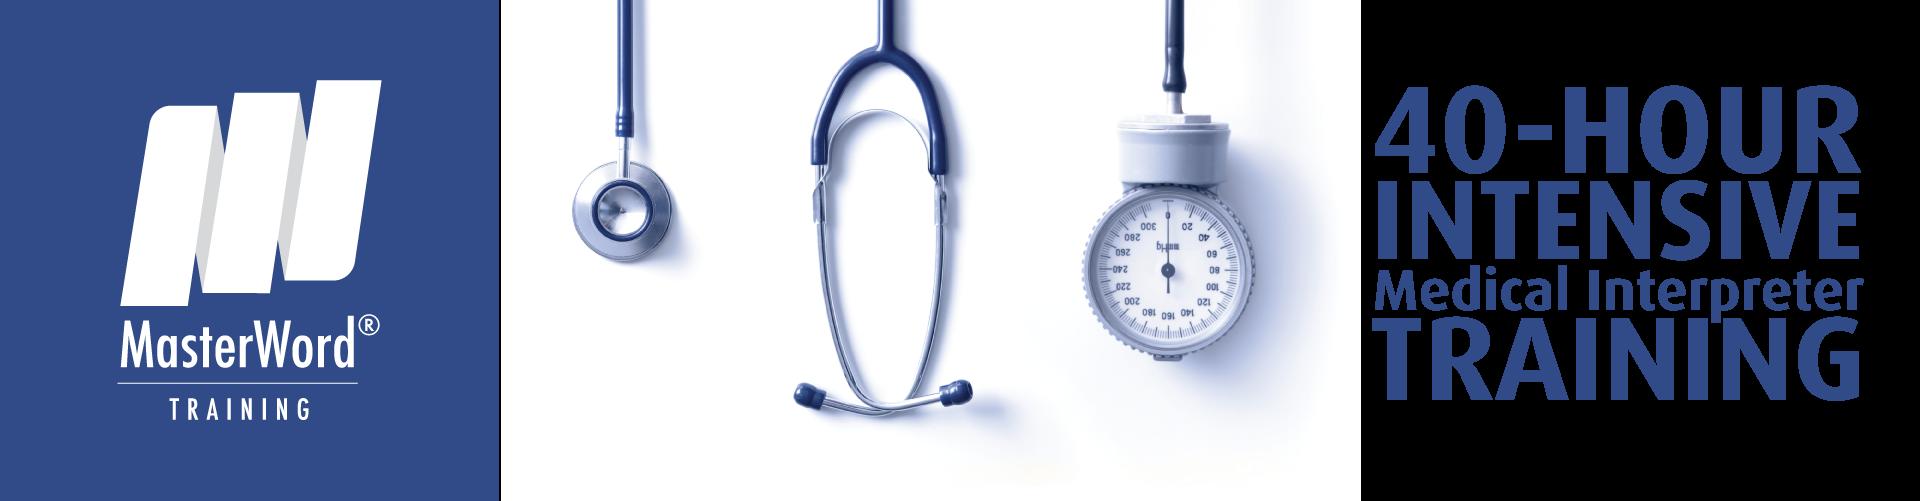 The 40hr Asl Intensive Medical Interpreter Training Masterword